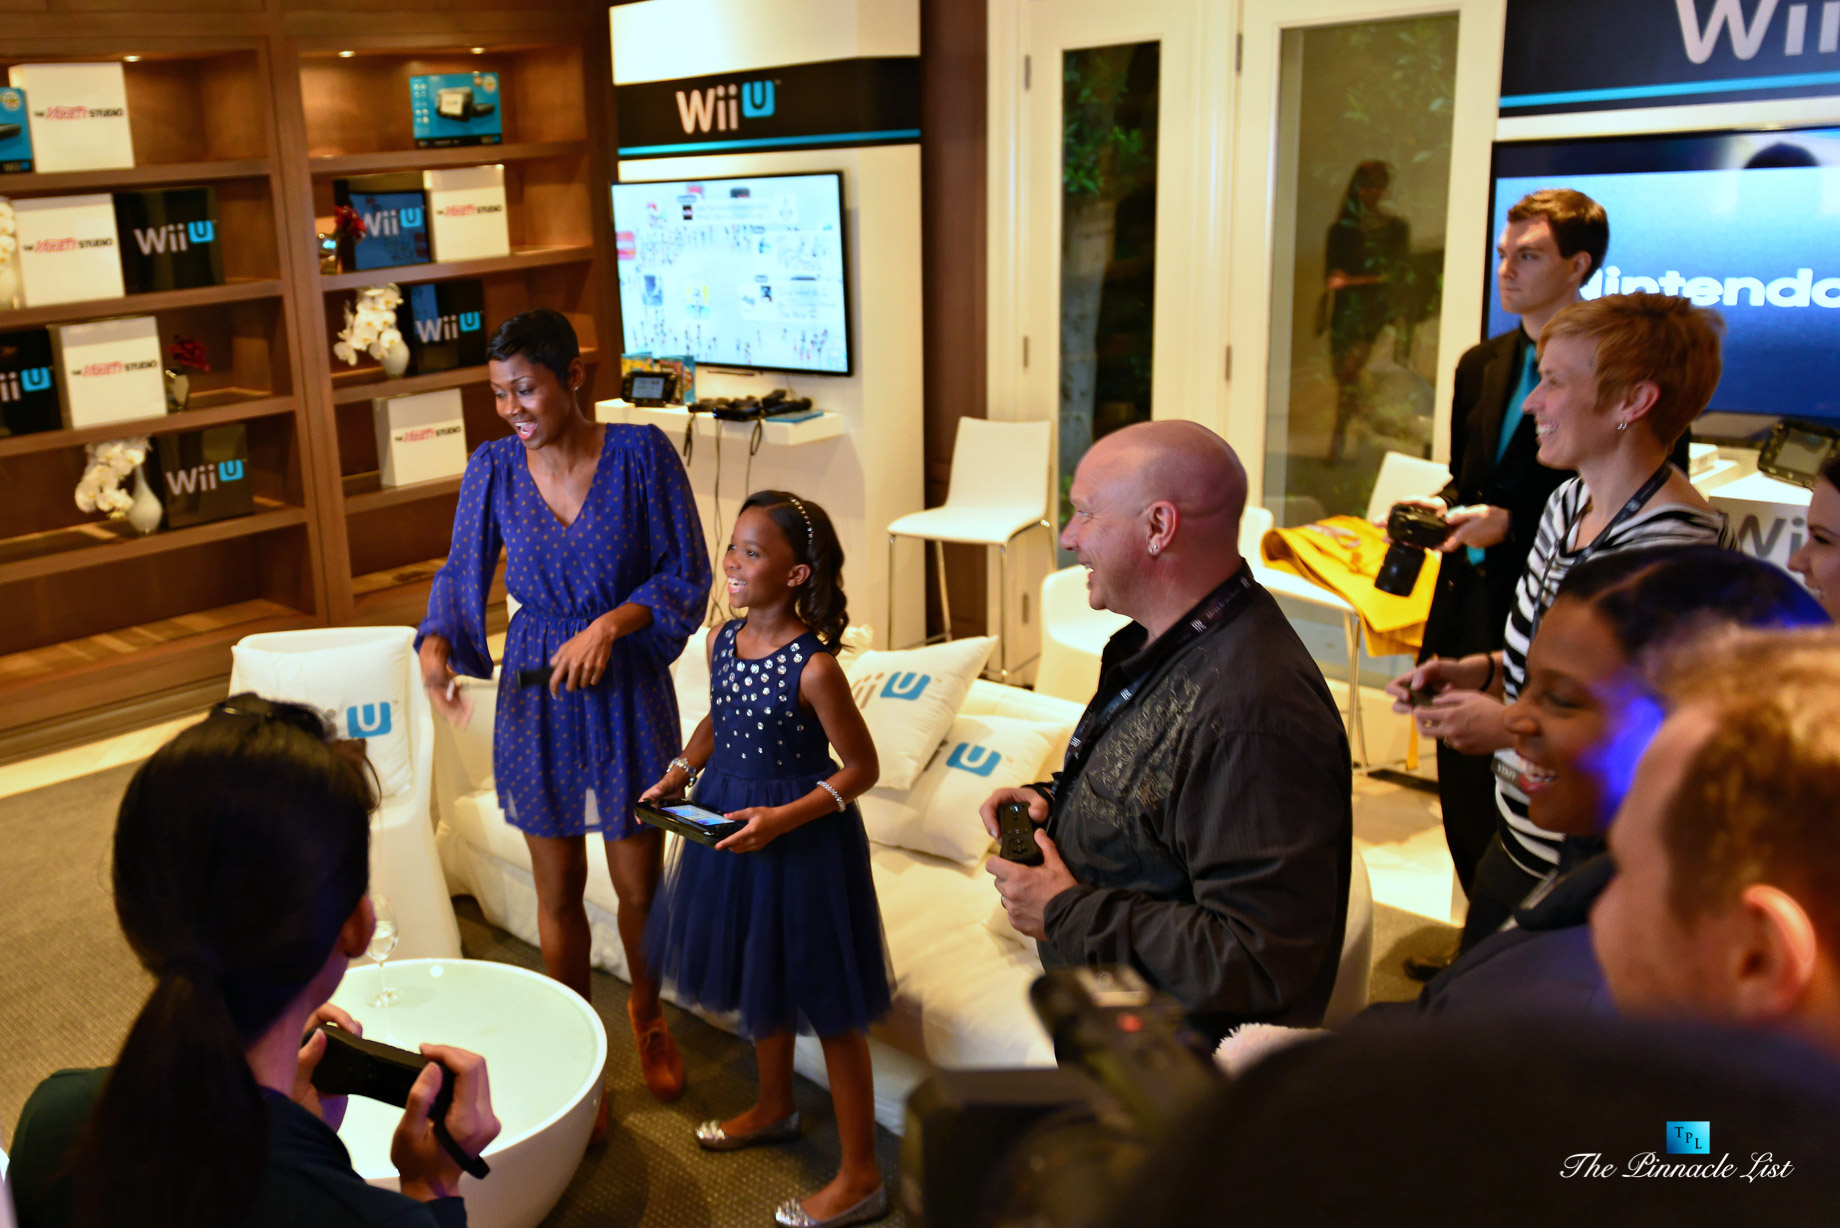 Emayatzy Corinealdi – Quvenzhane Wallis – Rolls-Royce Hosts The Variety Studio Event with Nintendo Wii U in Beverly Hills, California